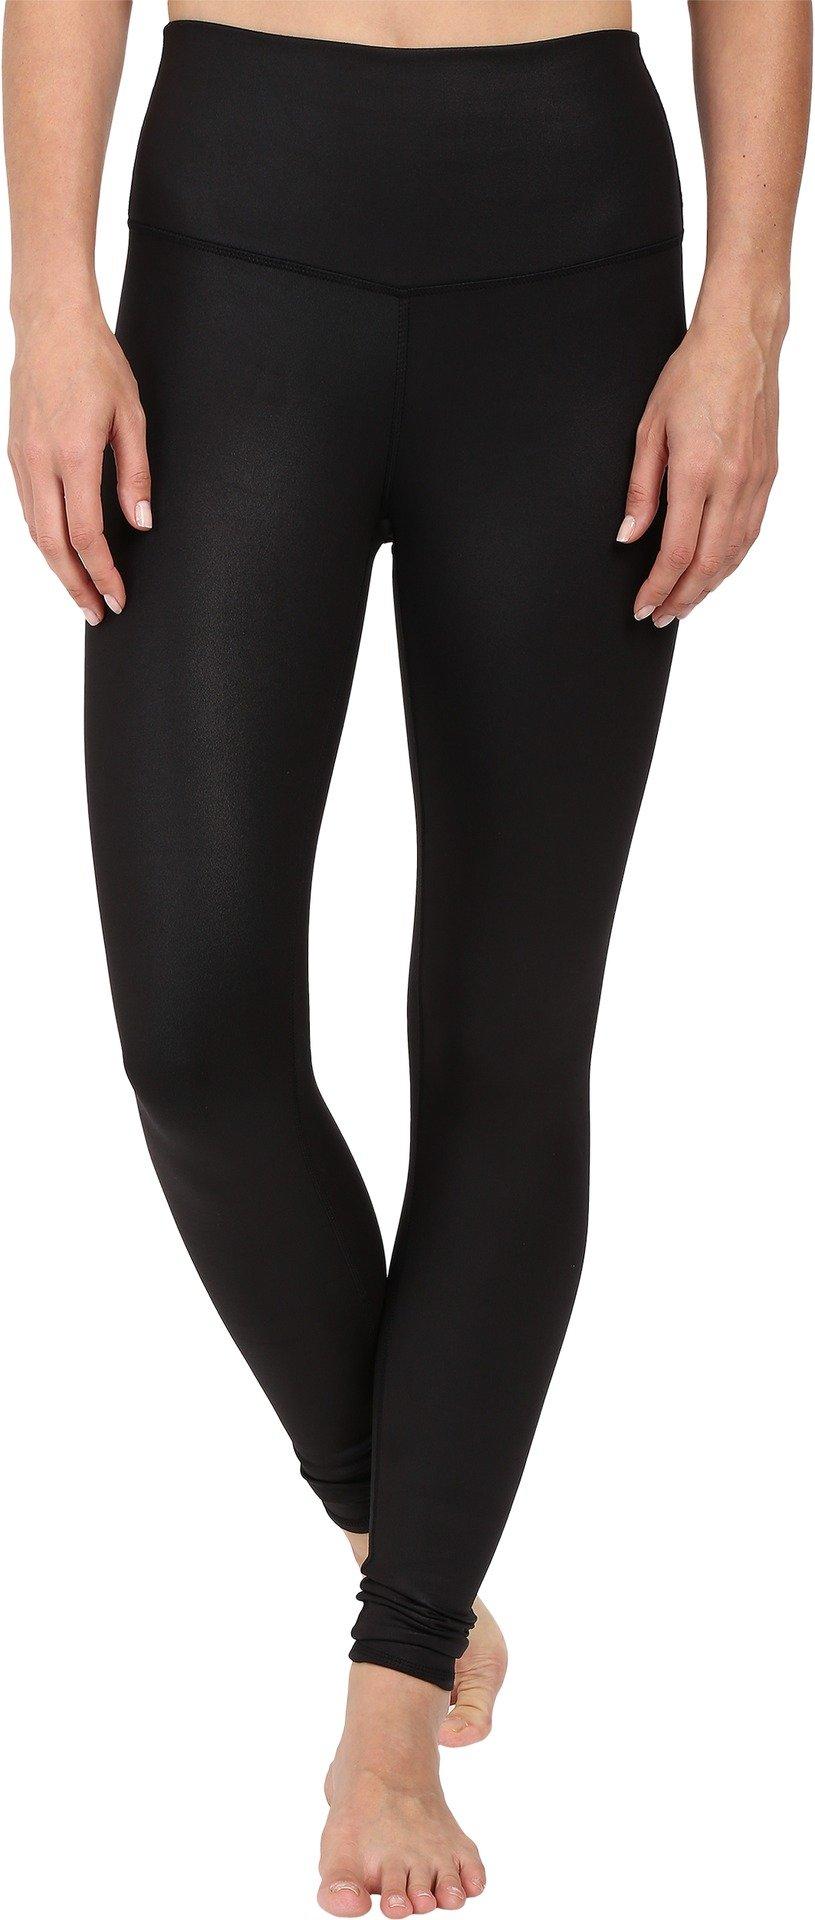 Alo Yoga Women's High Waist Airbrush Legging, Black Glossy, XX-Small